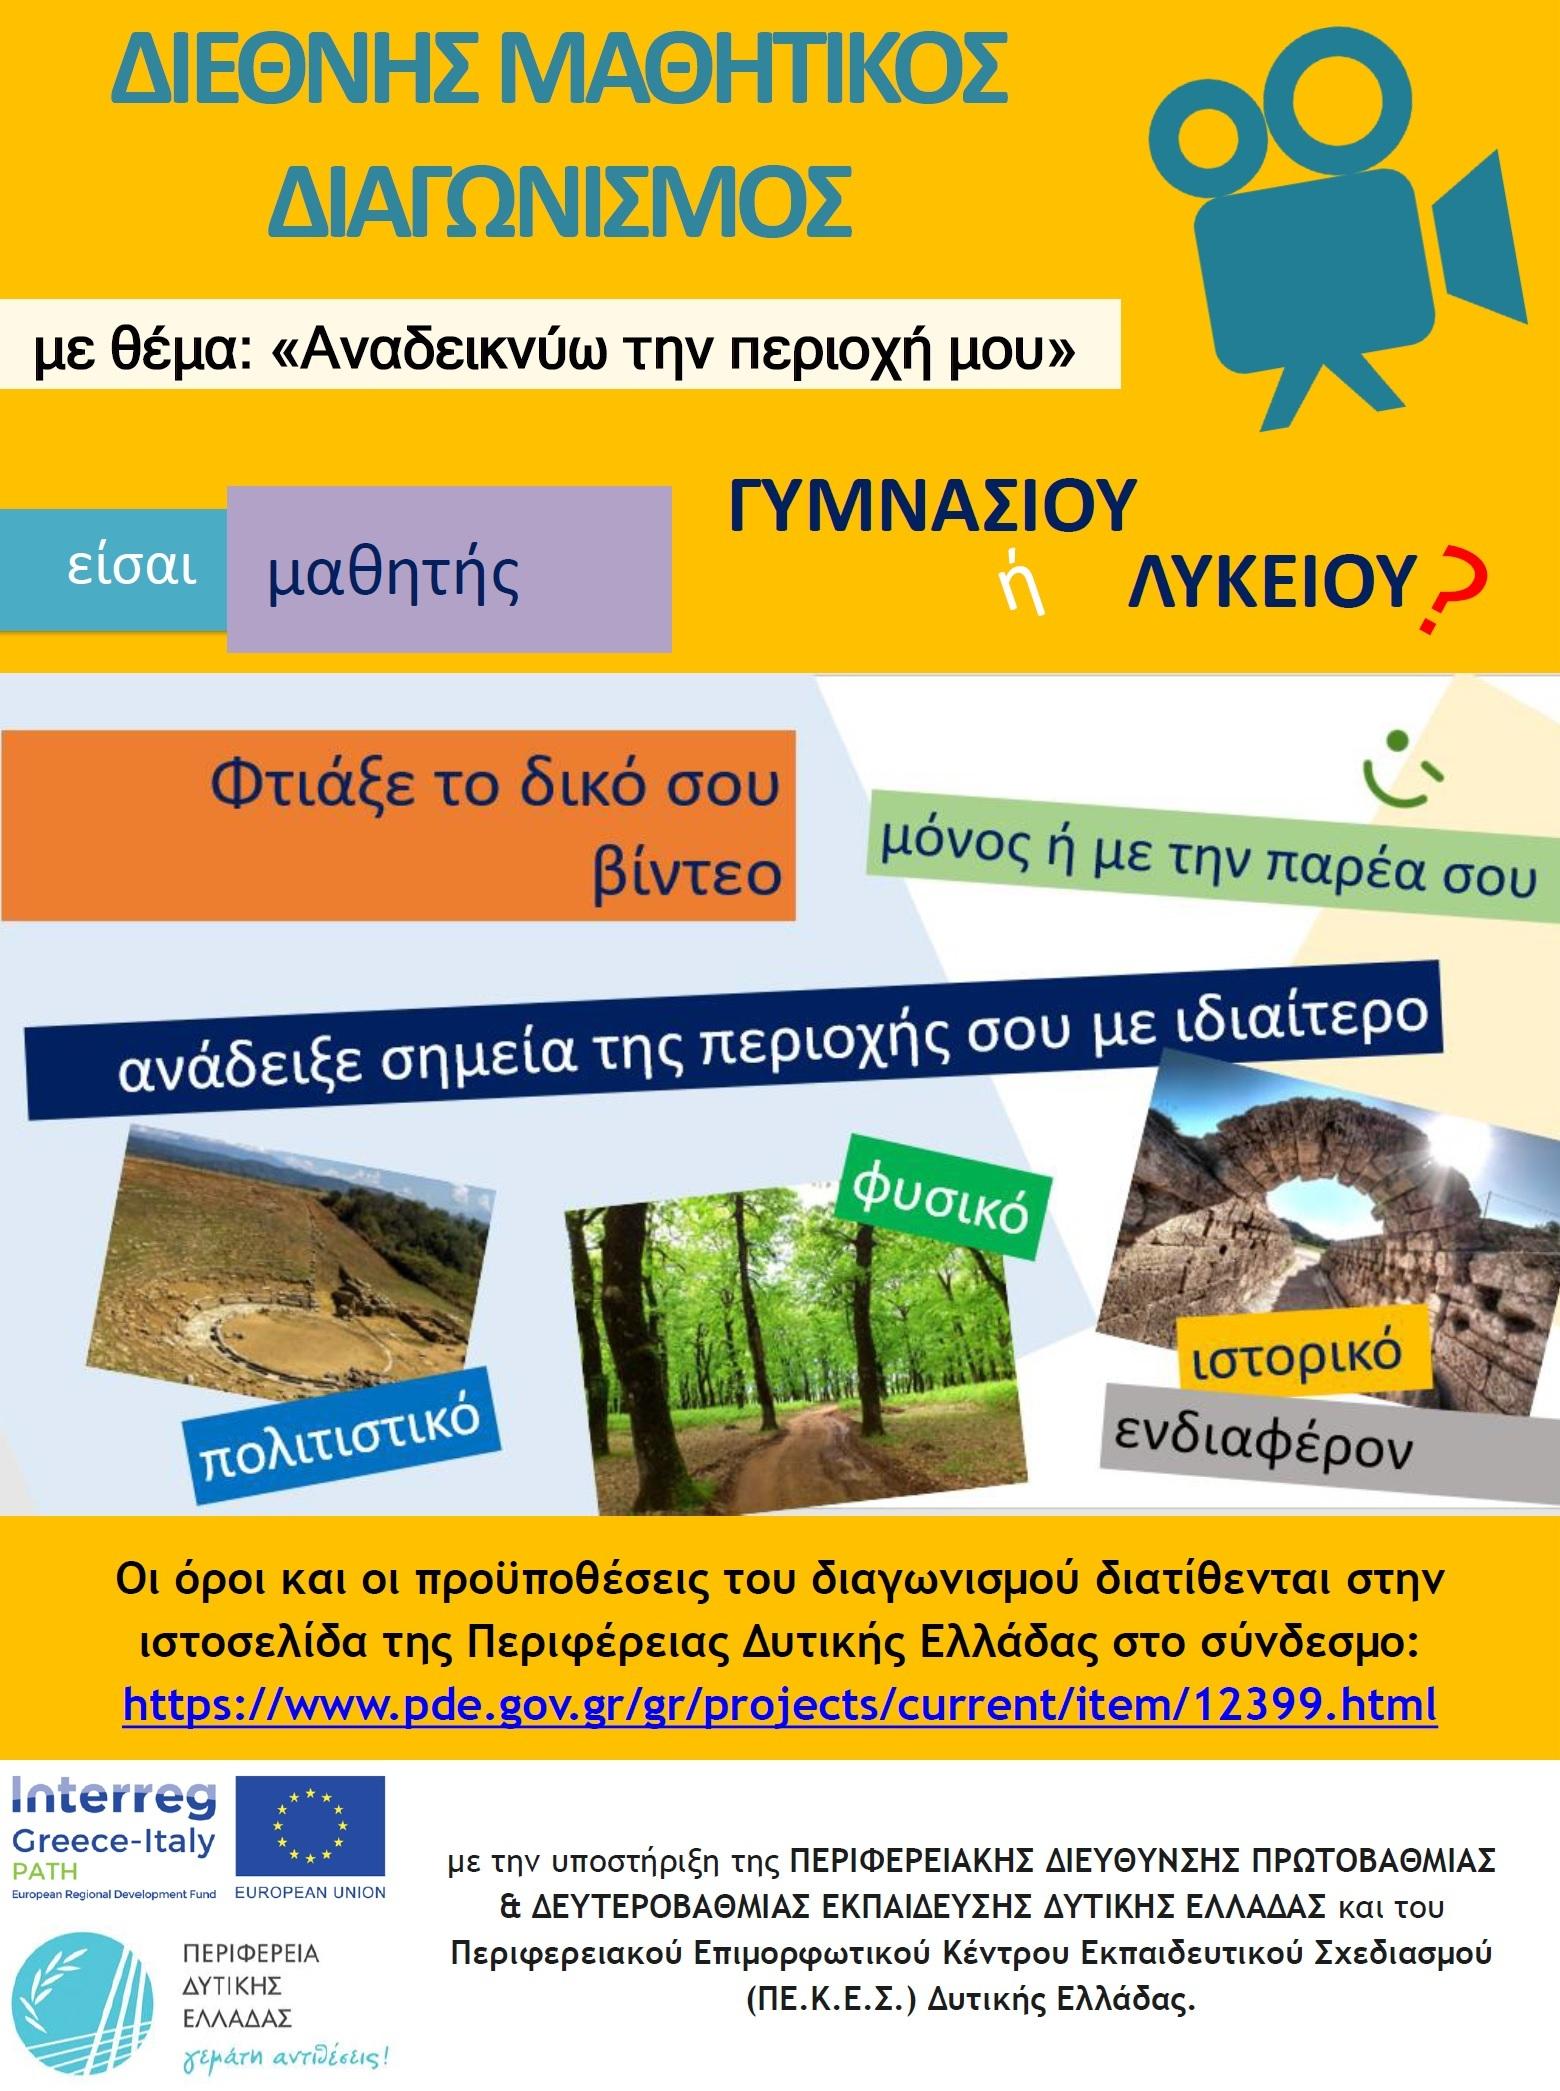 poster mathitikoy diagonismoy path 26102020